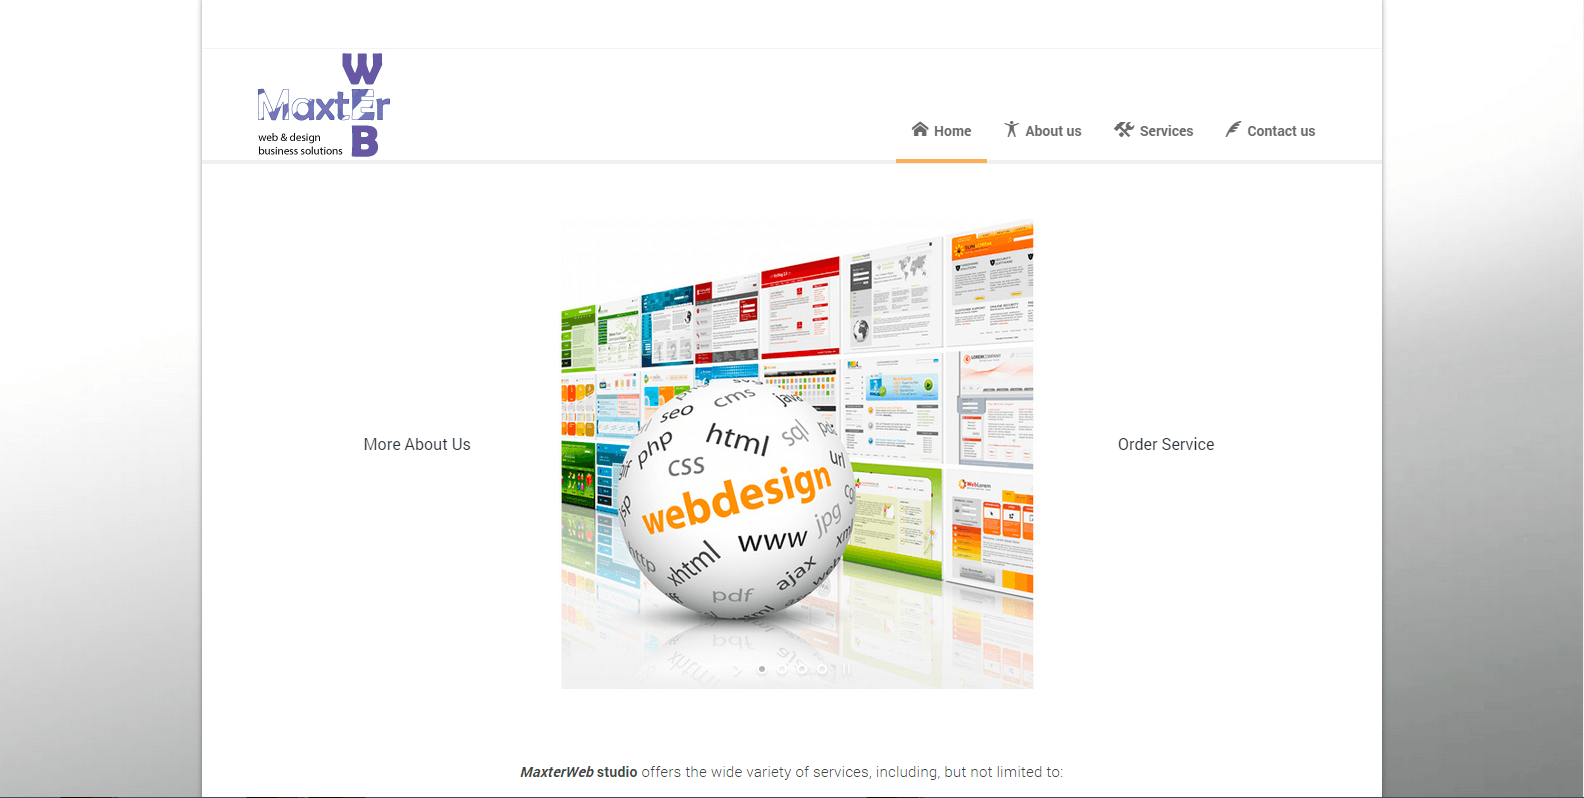 Разработка и поддержка WEB-сайта Maxterweb